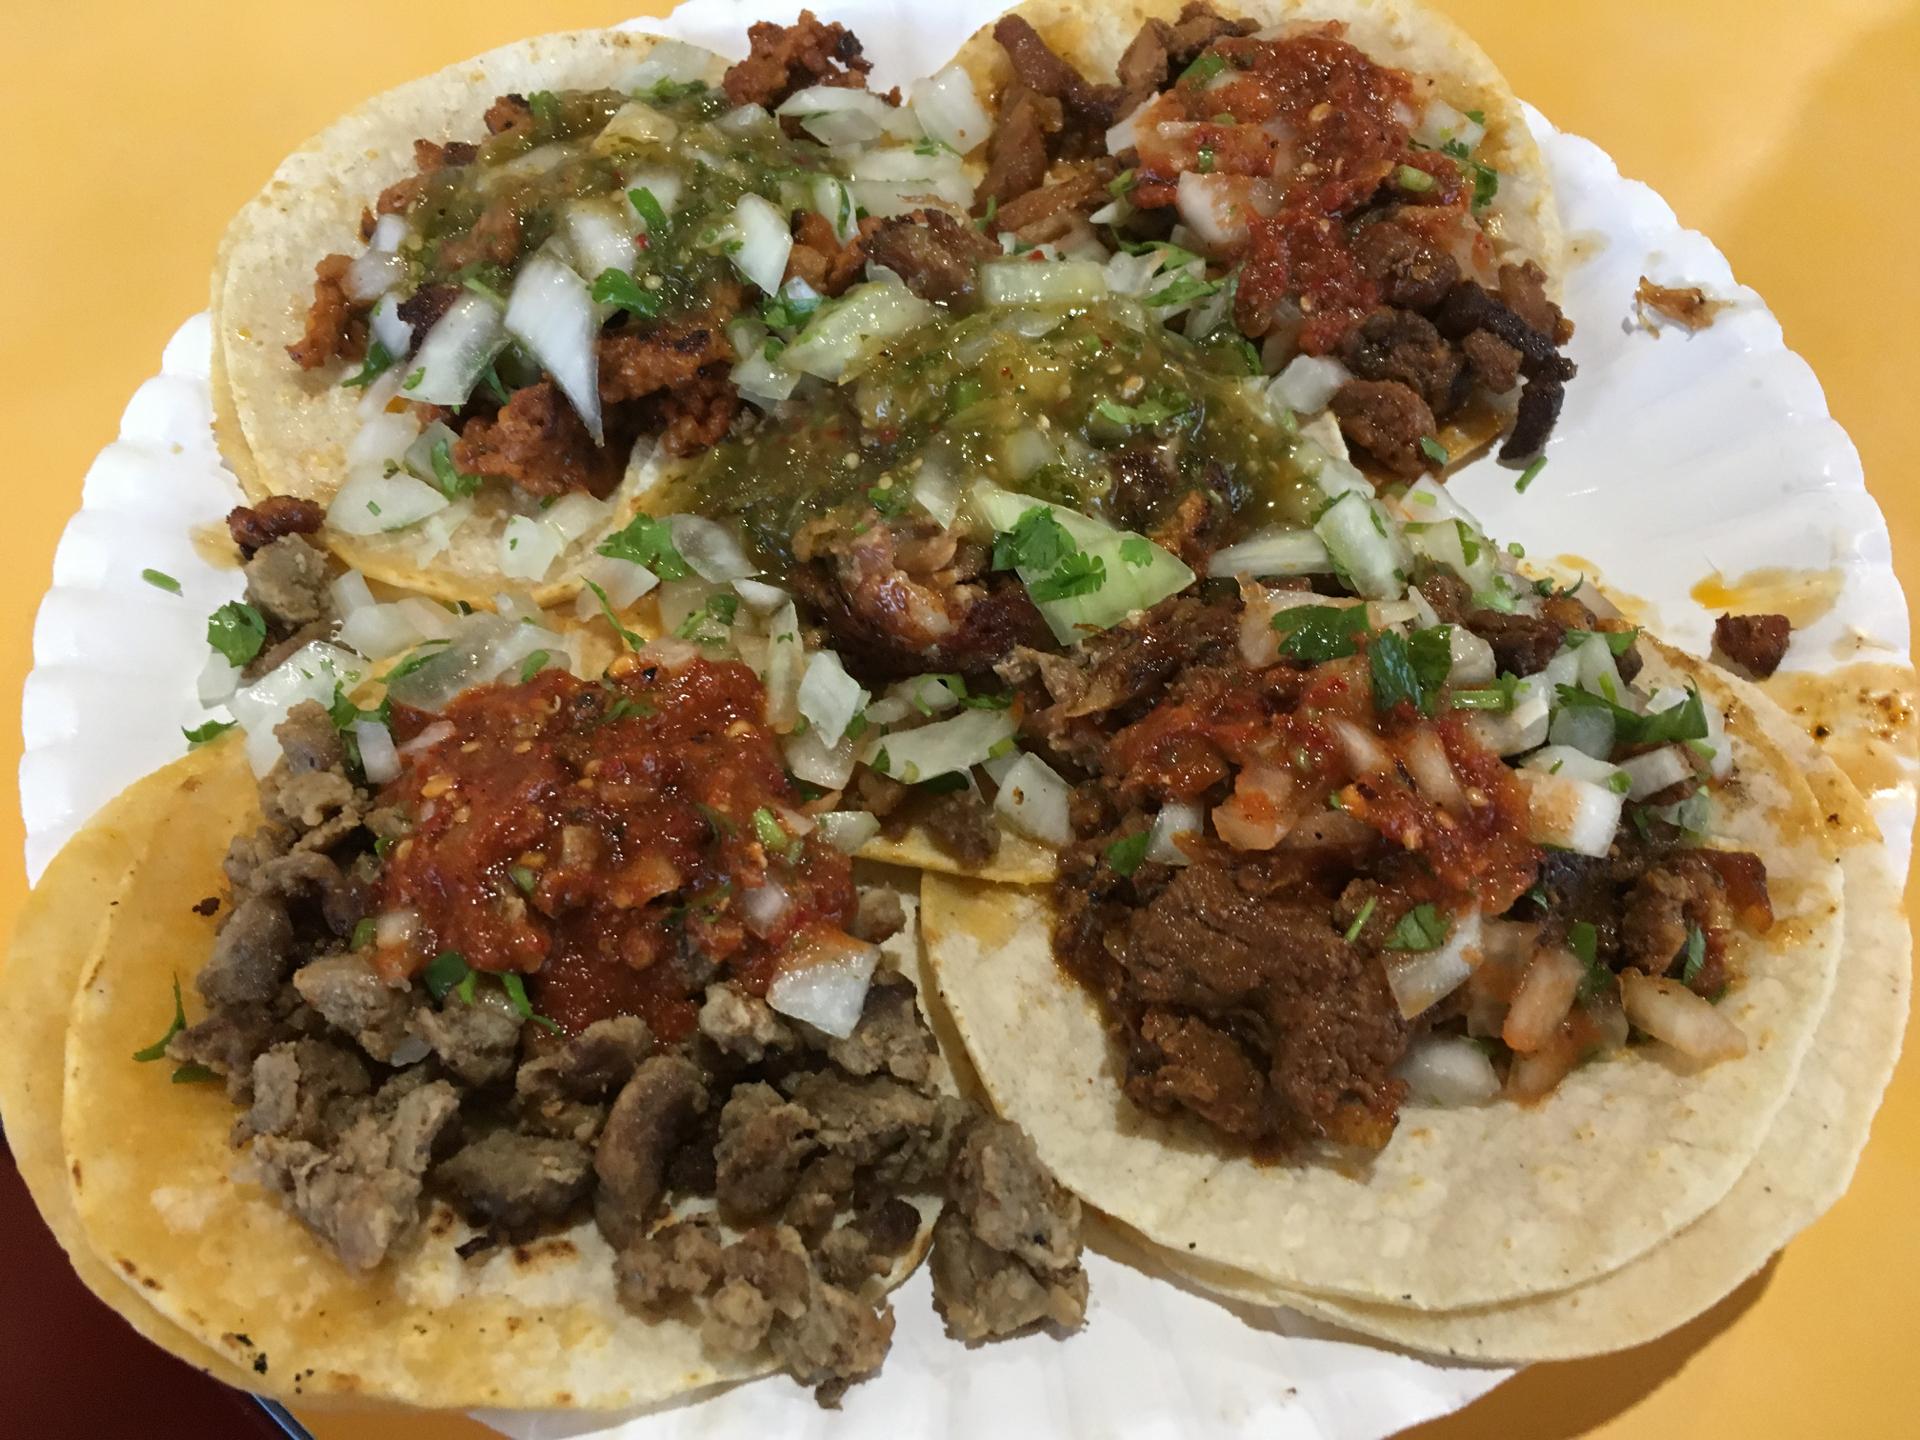 A plate of street tacos at El Grullense with carne asada, al pastor, chorizo, and carnitas.